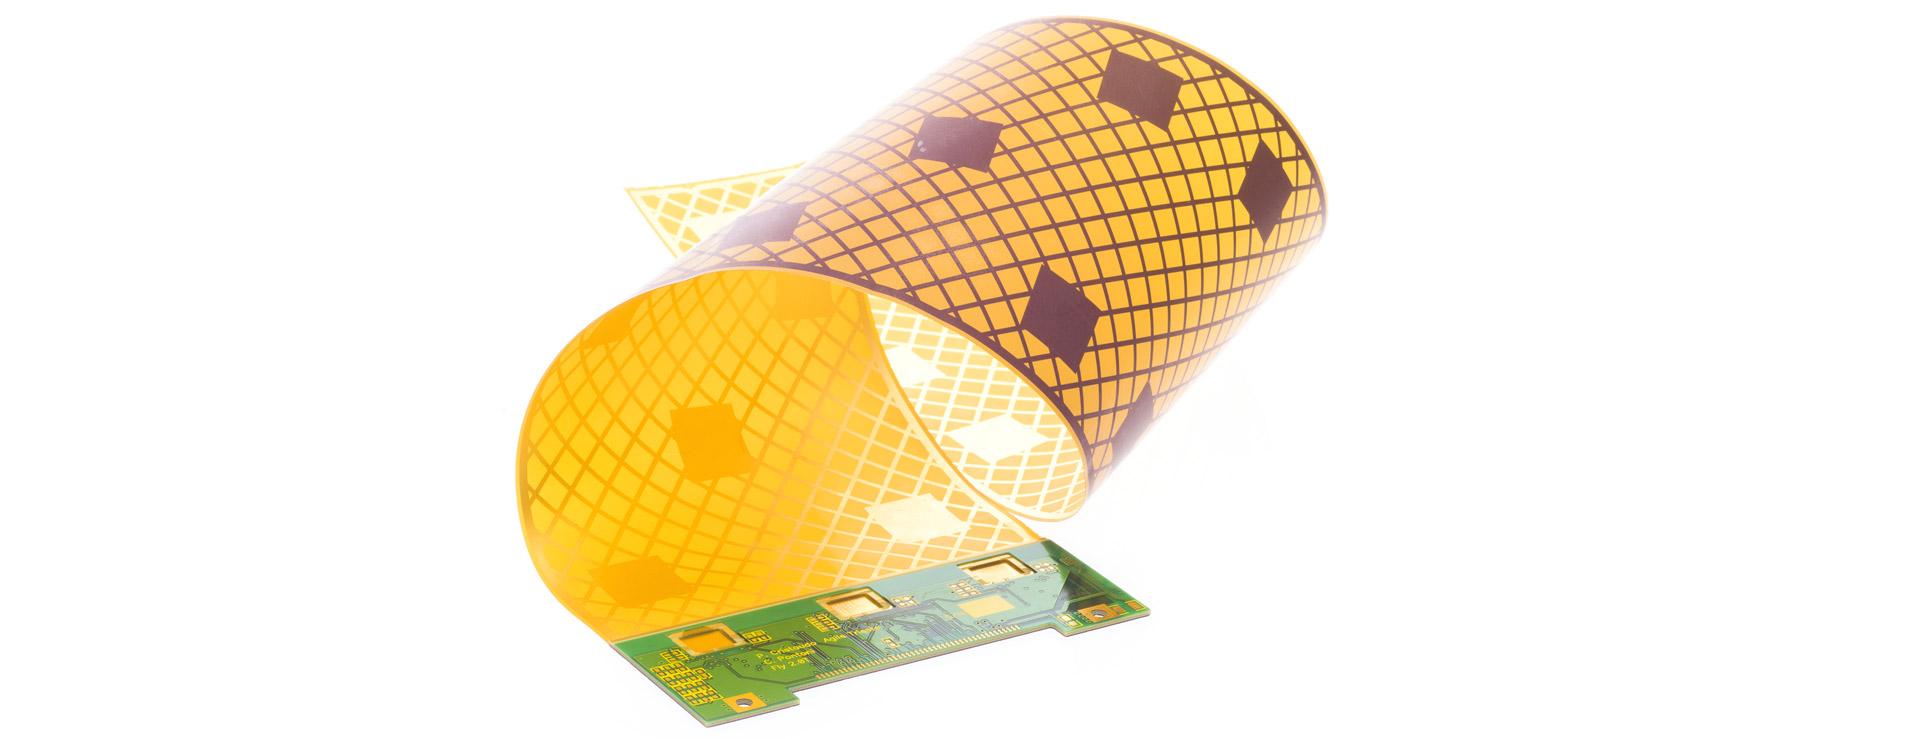 ELPEPCB®  - 印刷线路涂层材料